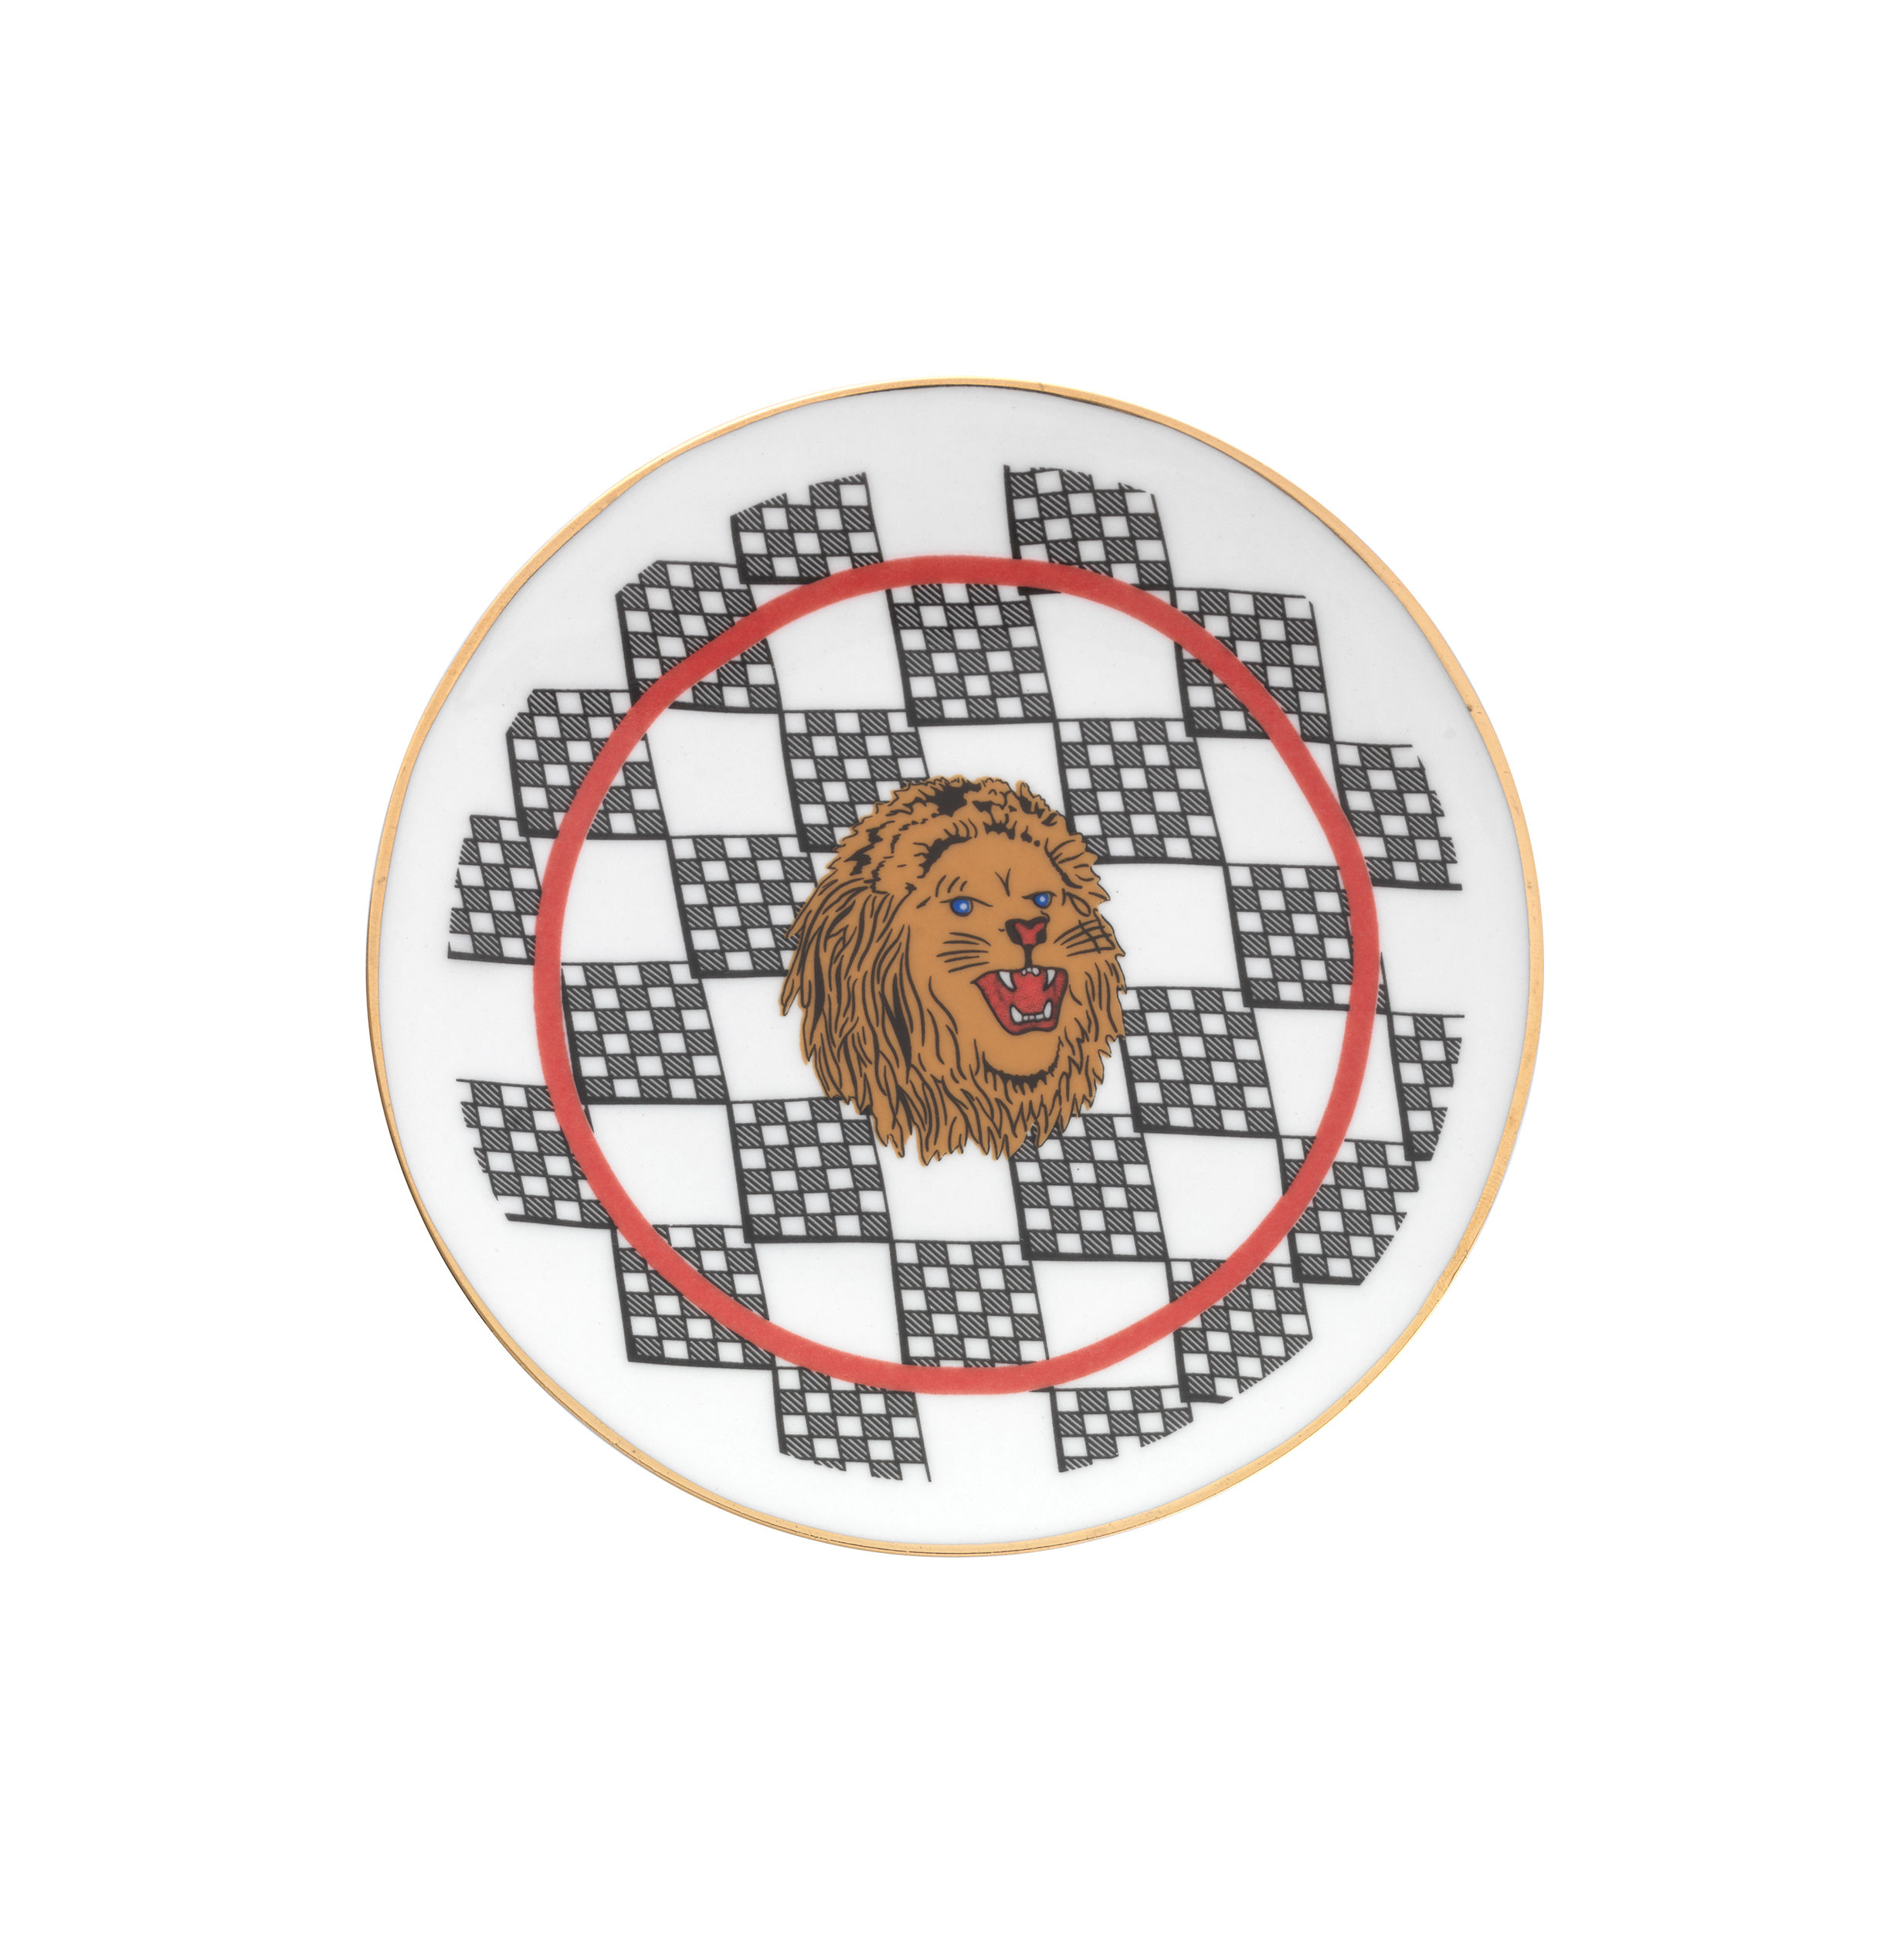 Tavola - Piatti  - Piatto da dessert Bel Paese - Leone - / Ø 12 cm di Bitossi Home - Leone - Porcellana